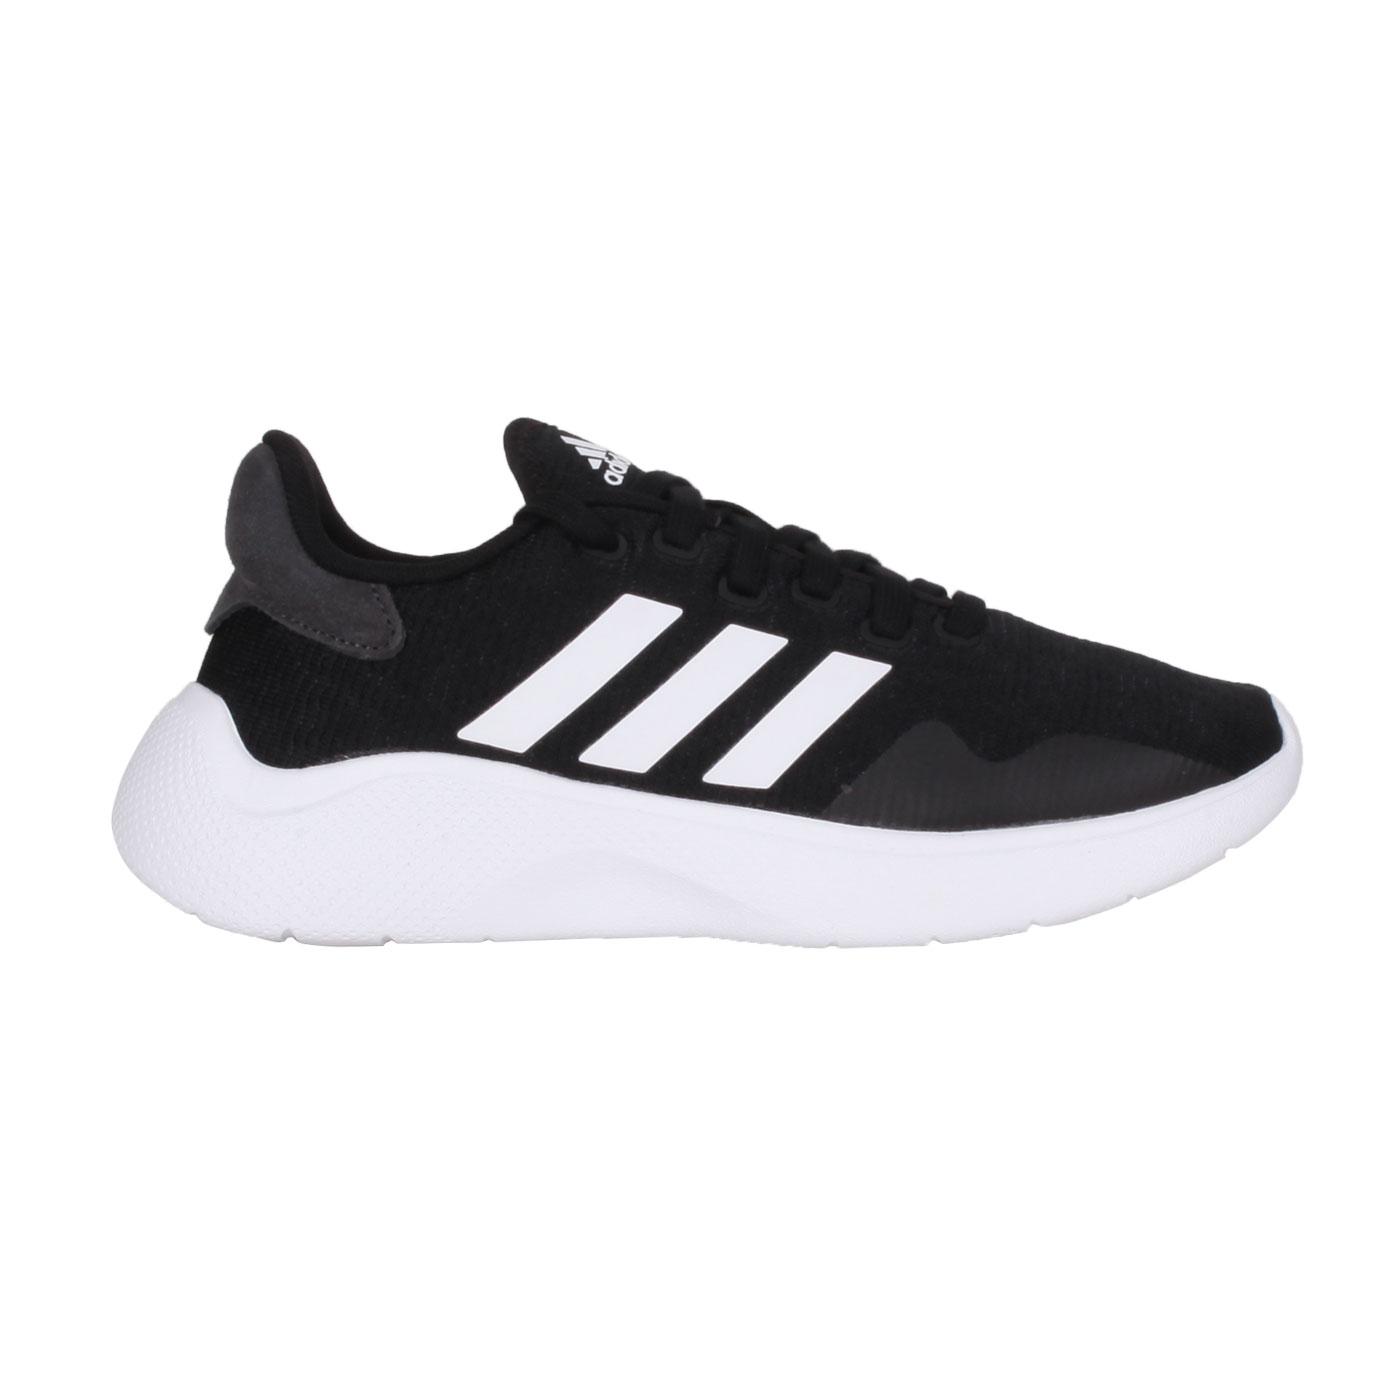 NEW BALANCE 女款休閒運動鞋 WS237DH1